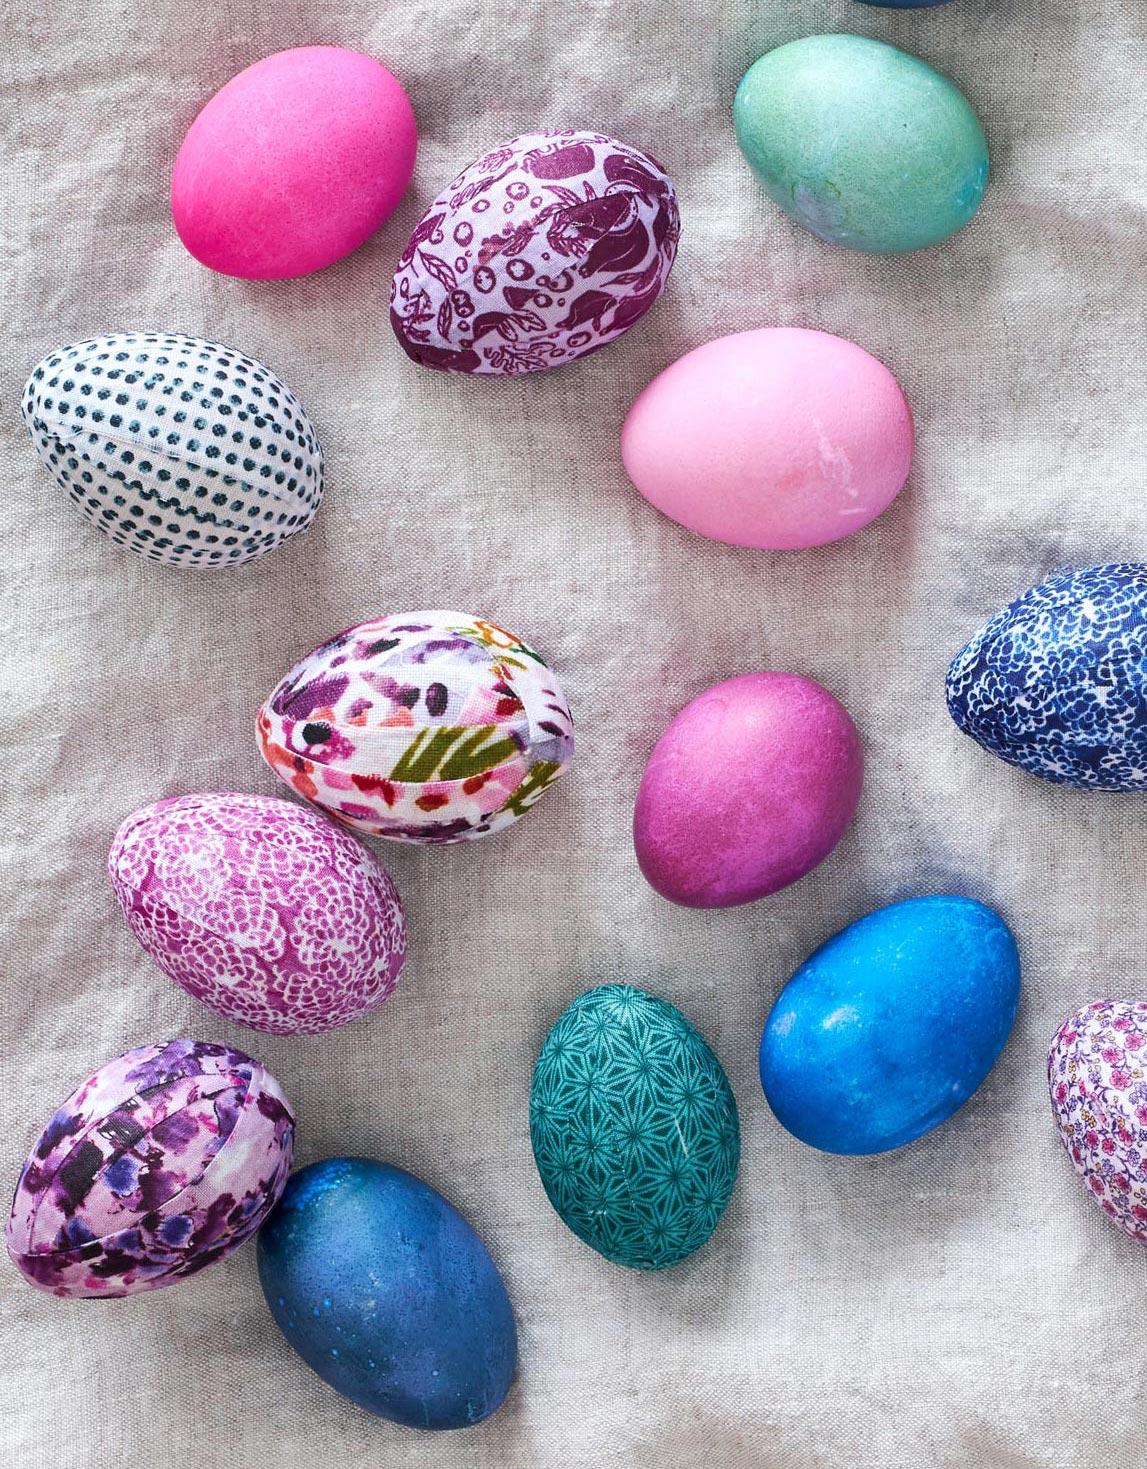 Eye-catching eggs